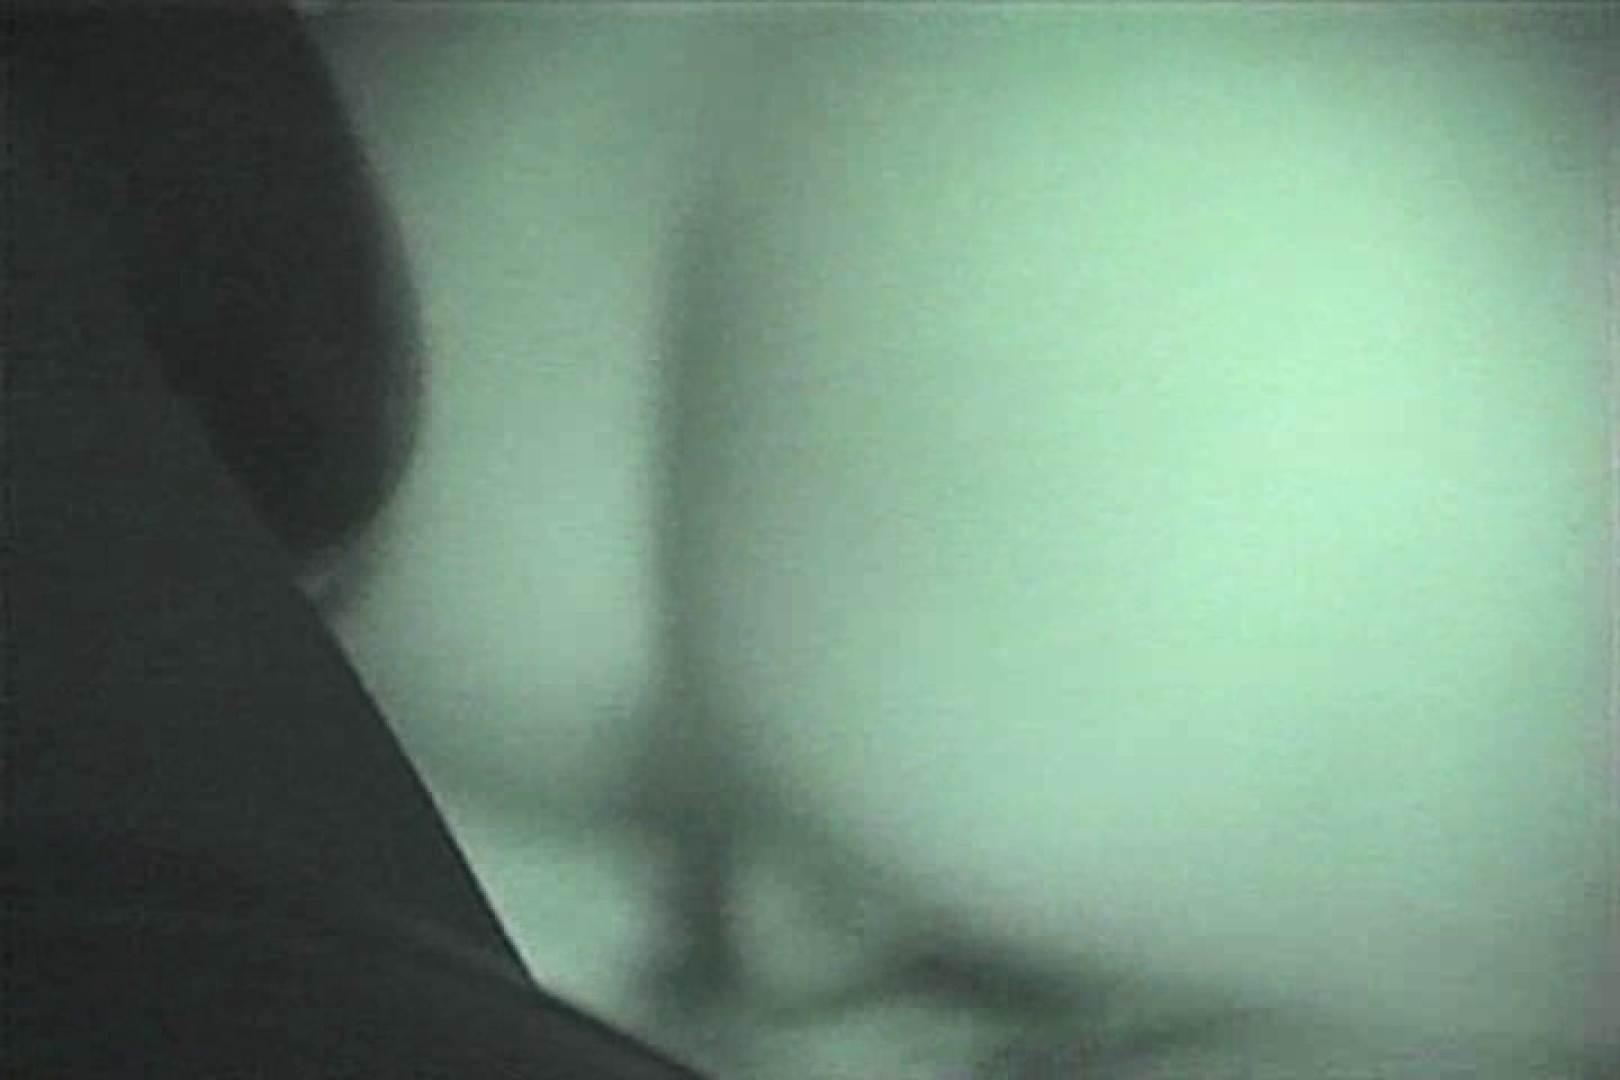 MASAさんの待ち伏せ撮り! 赤外線カーセックスVol.19 セックス エロ無料画像 89画像 42